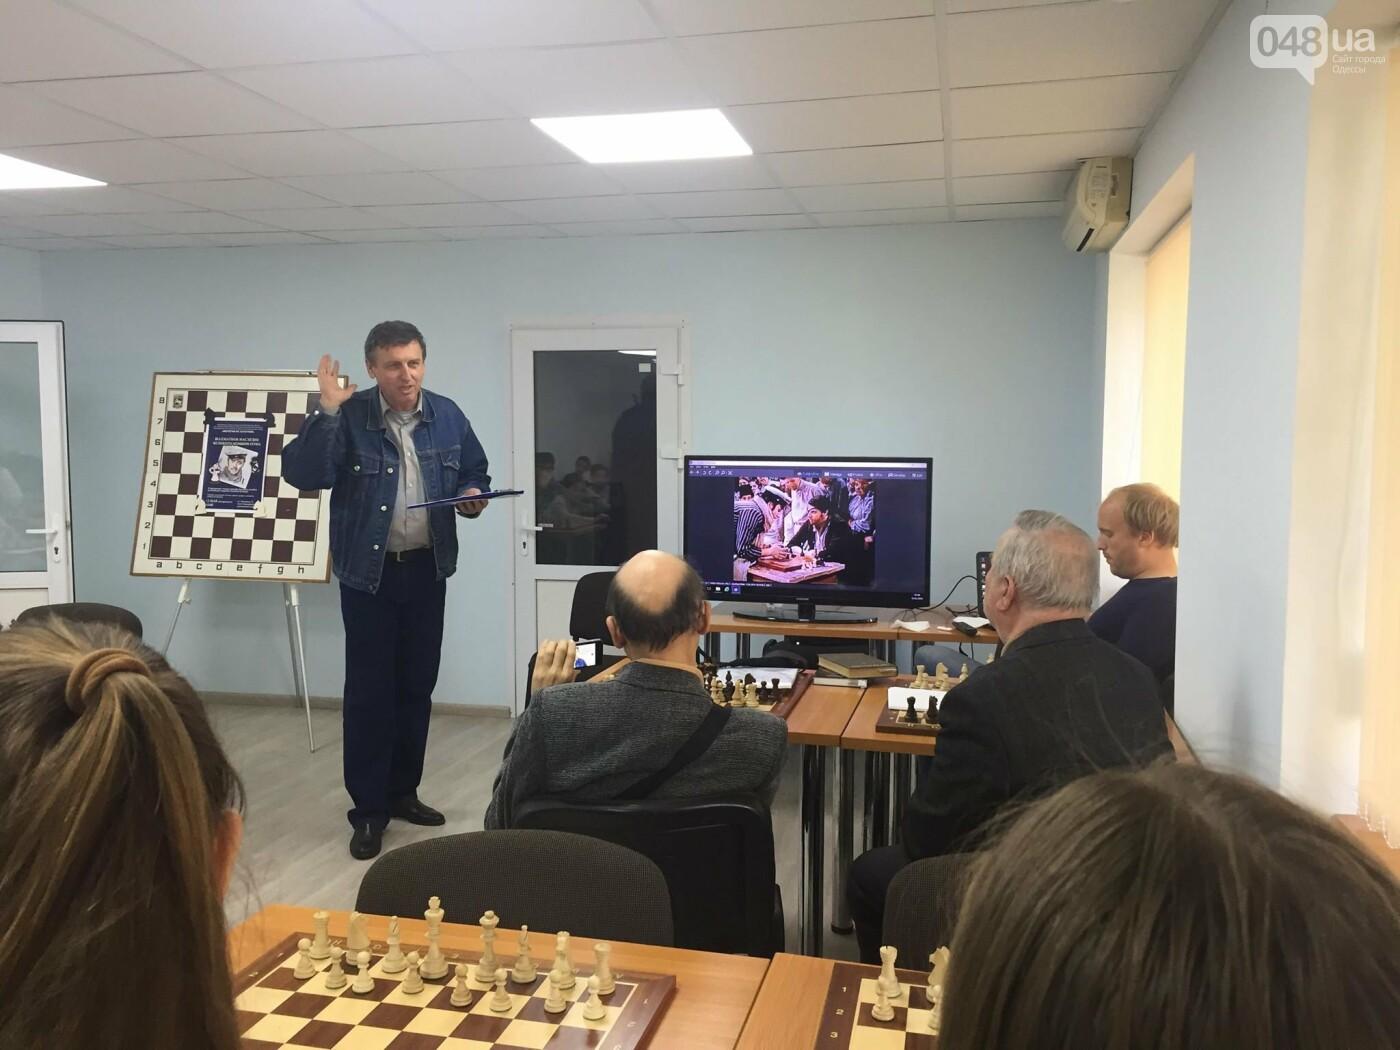 Одесситам рассказали о шахматном наследии Остапа Бендера,  - ФОТО, ВИДЕО, фото-3, Фото: 048